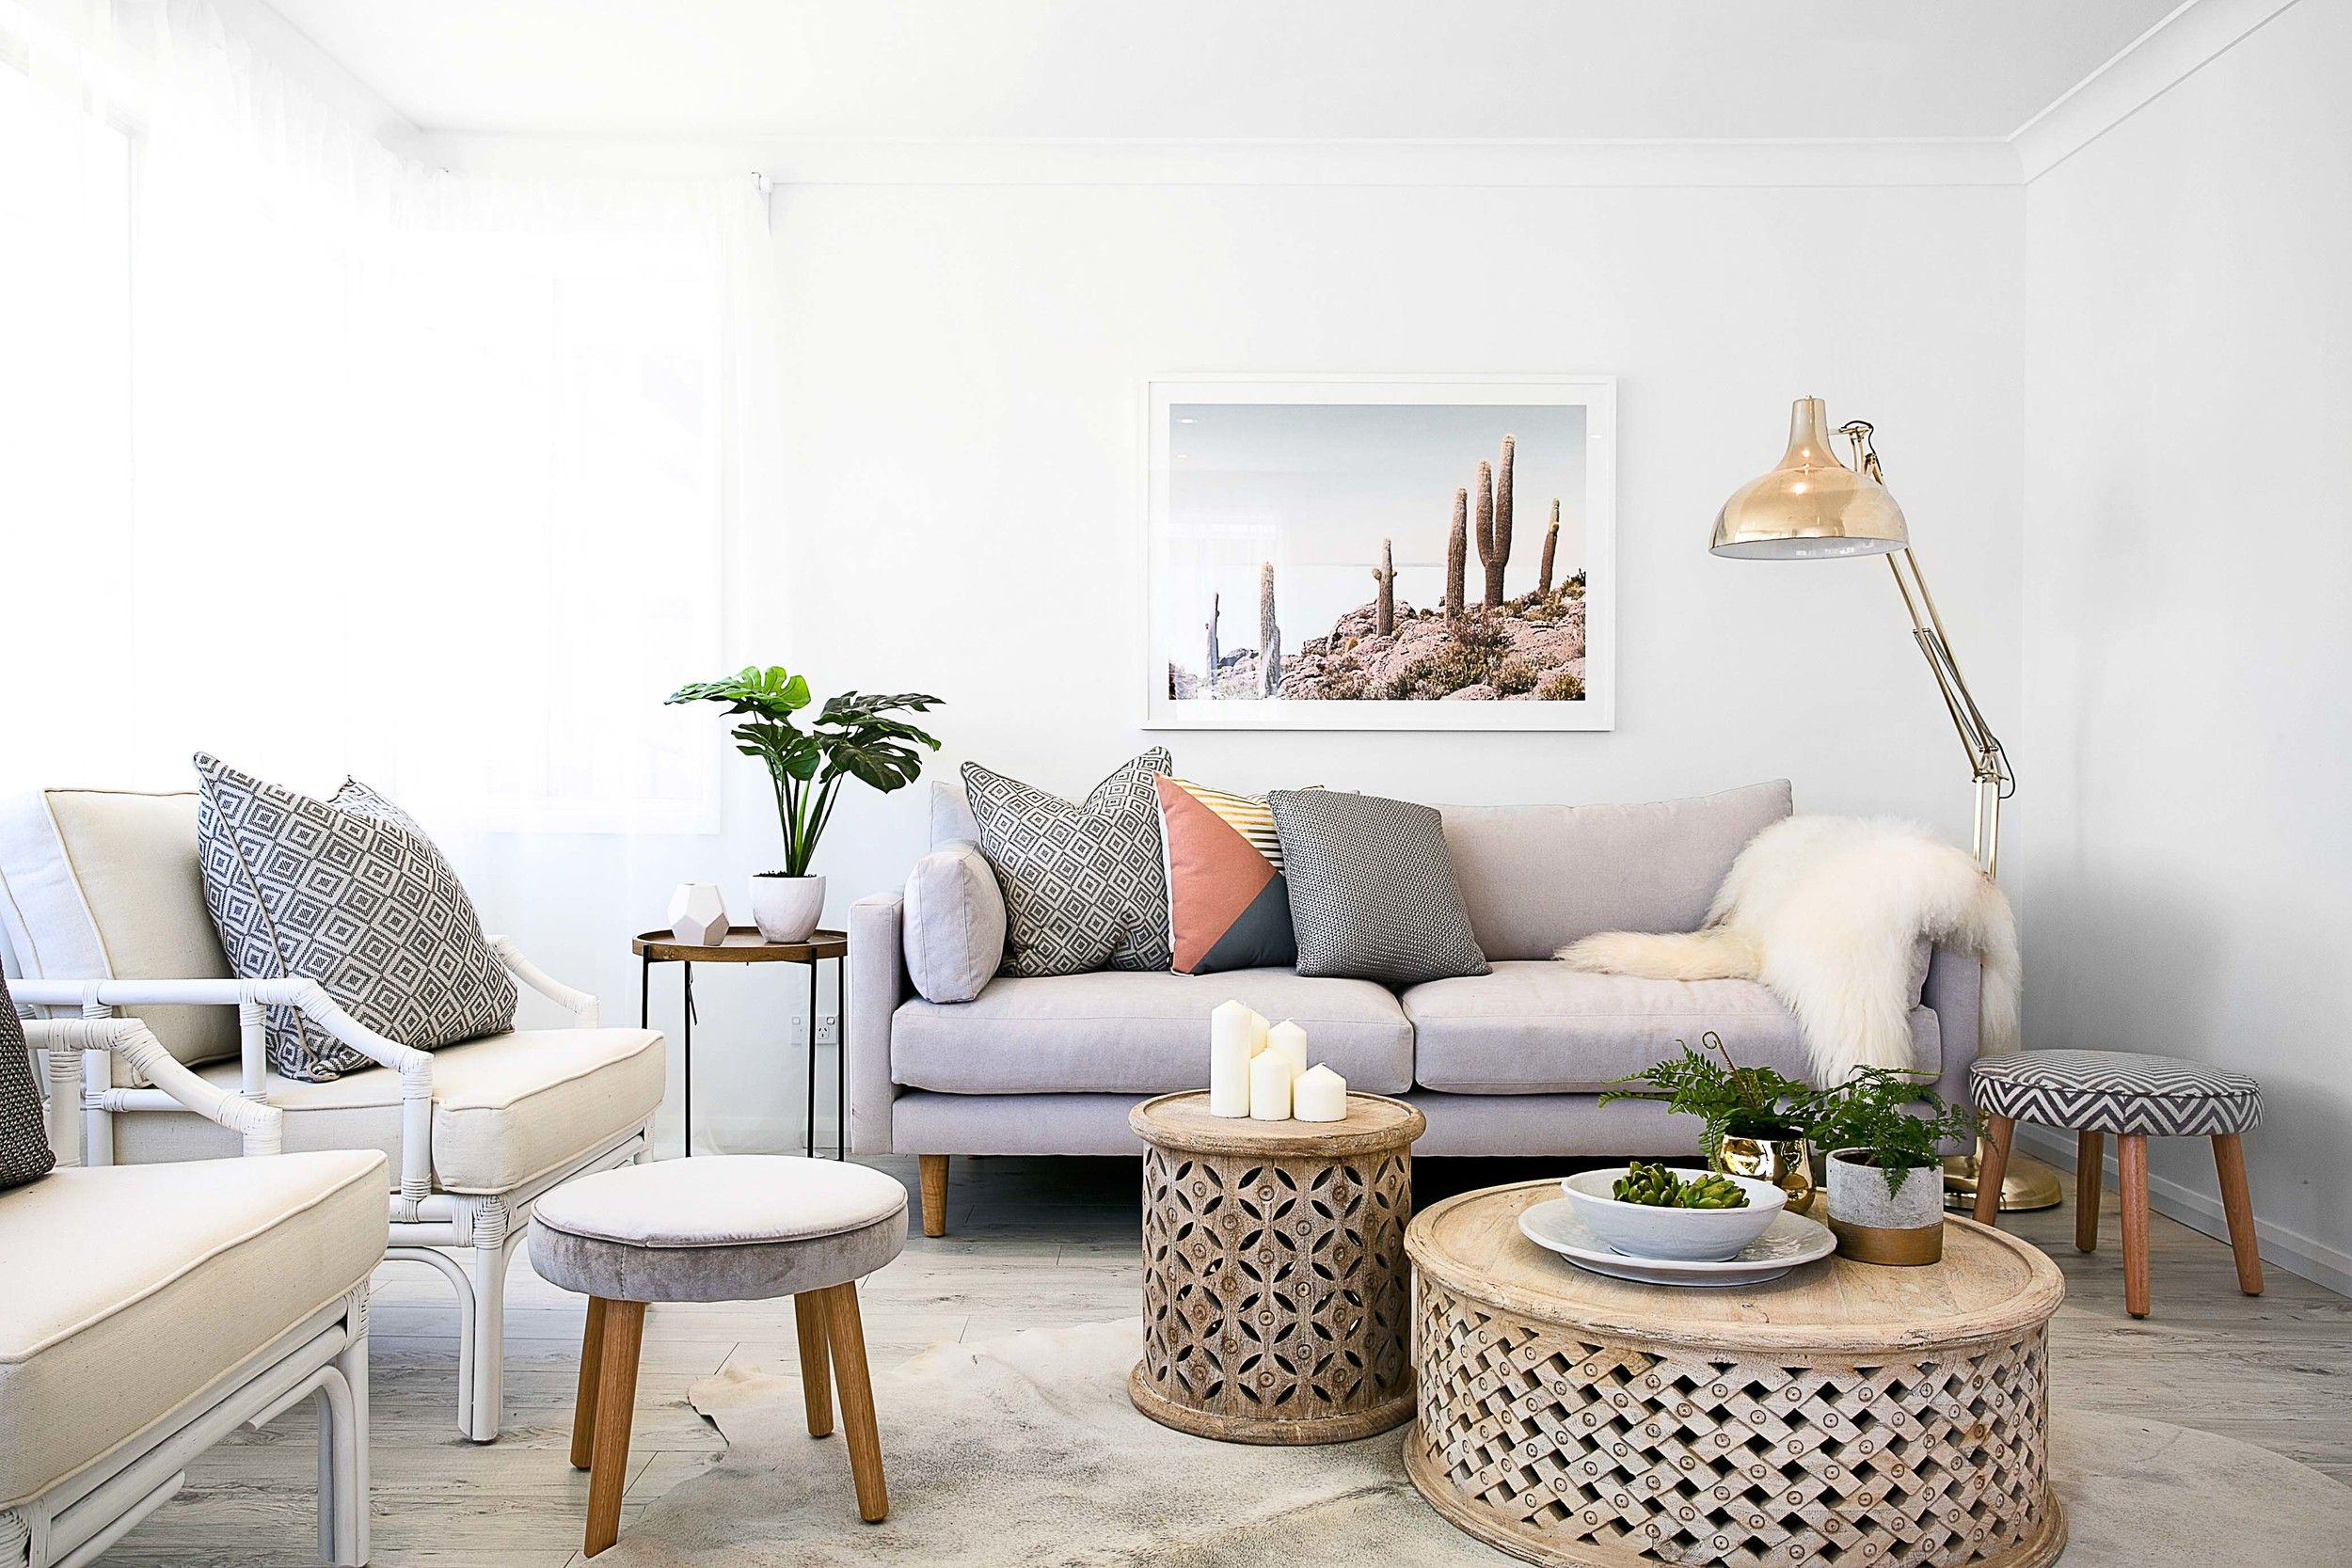 Decor Inspiration Refined Beach Style In Sydney Australia Australian Home Decor Oz Design Furniture Living Room Reveal